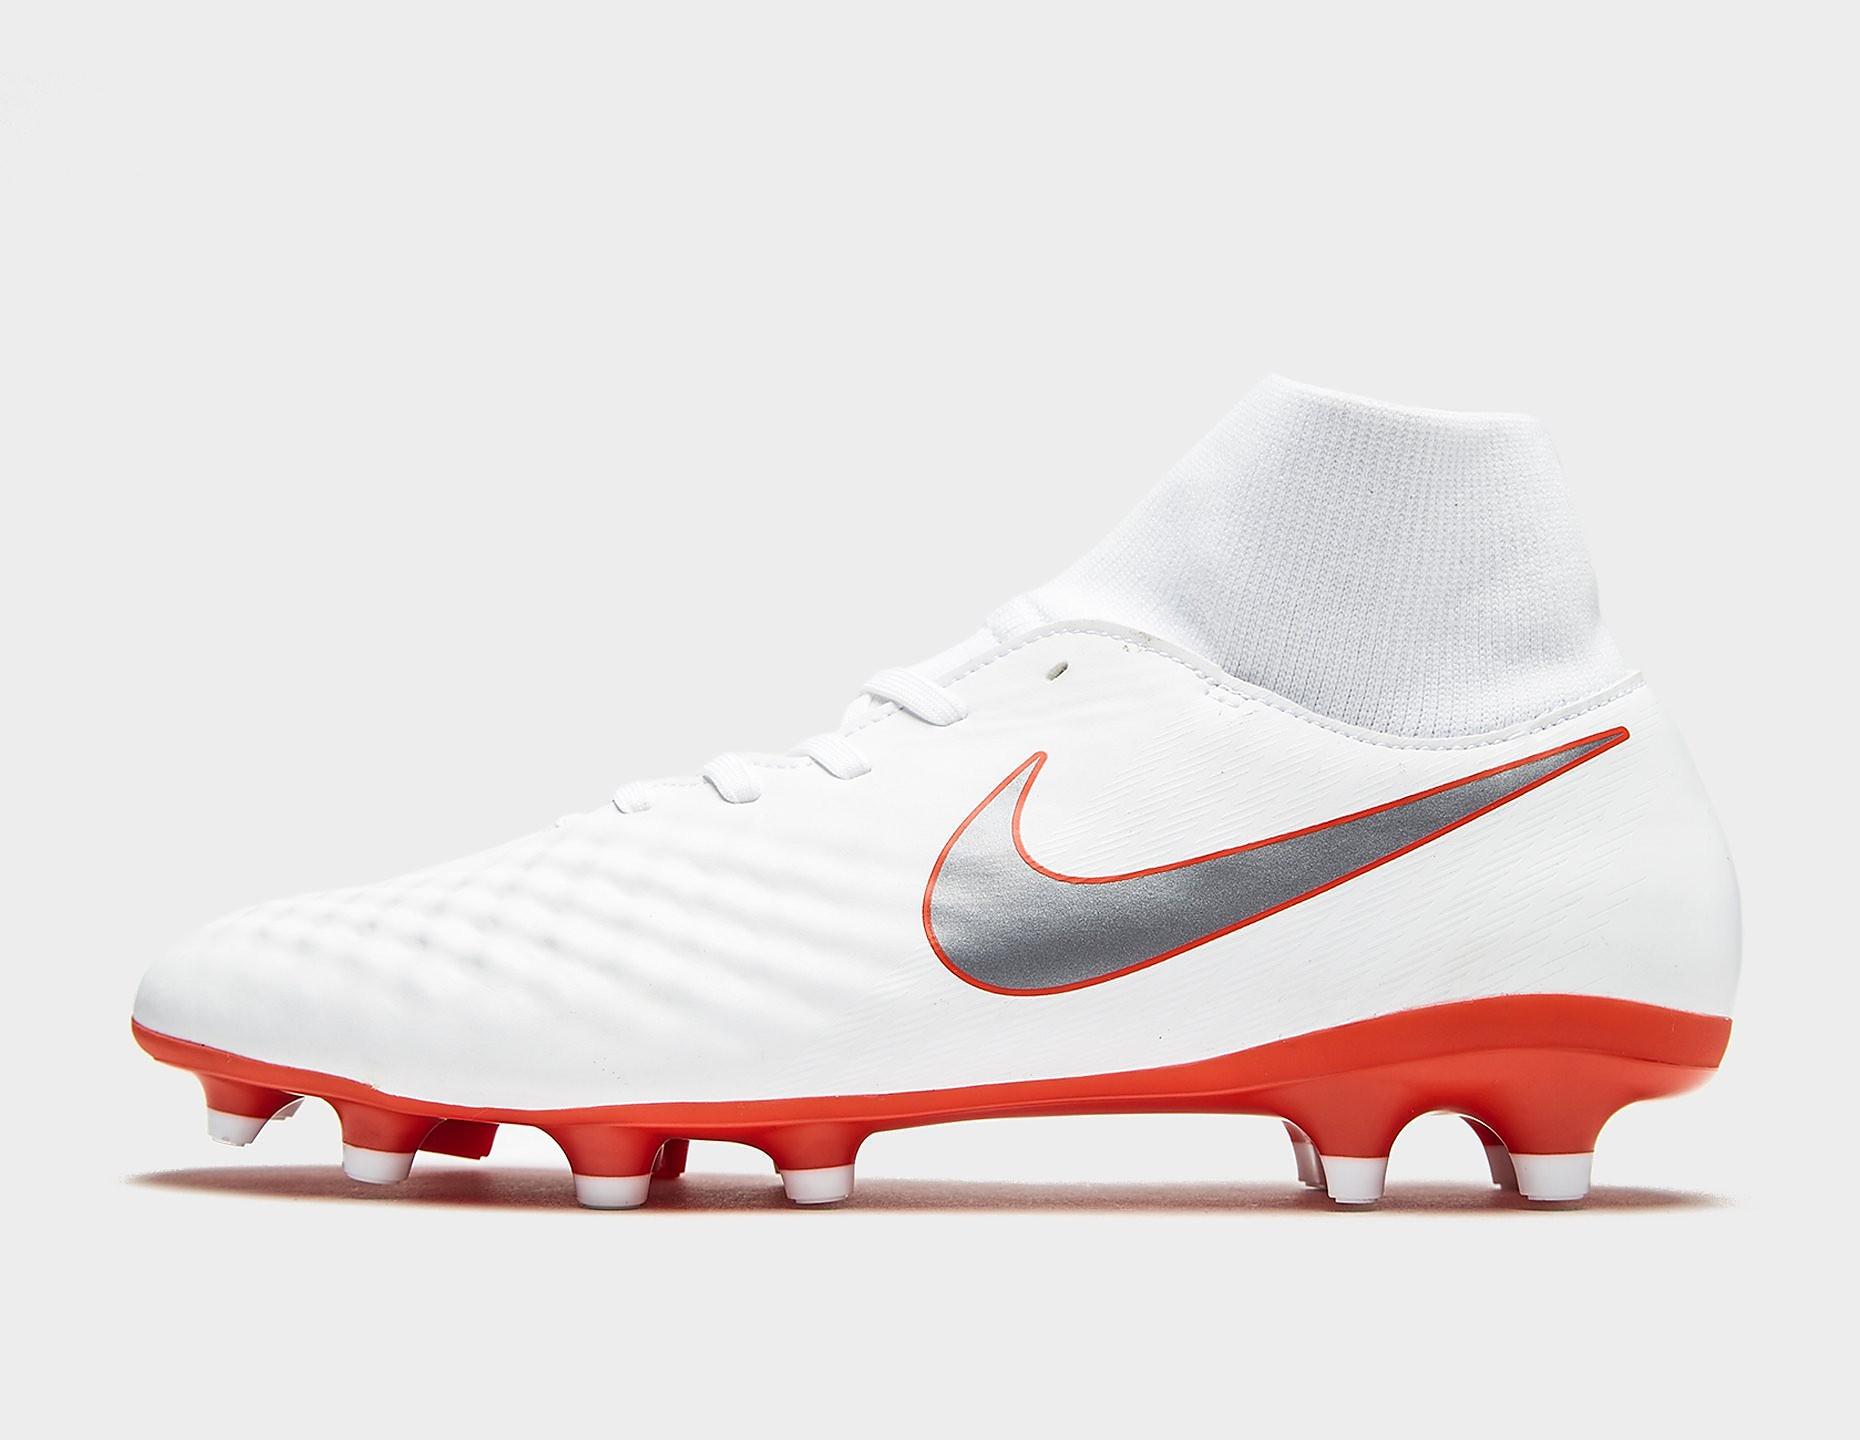 Nike Just Do It Magista Phantom Dynamic Fit FG